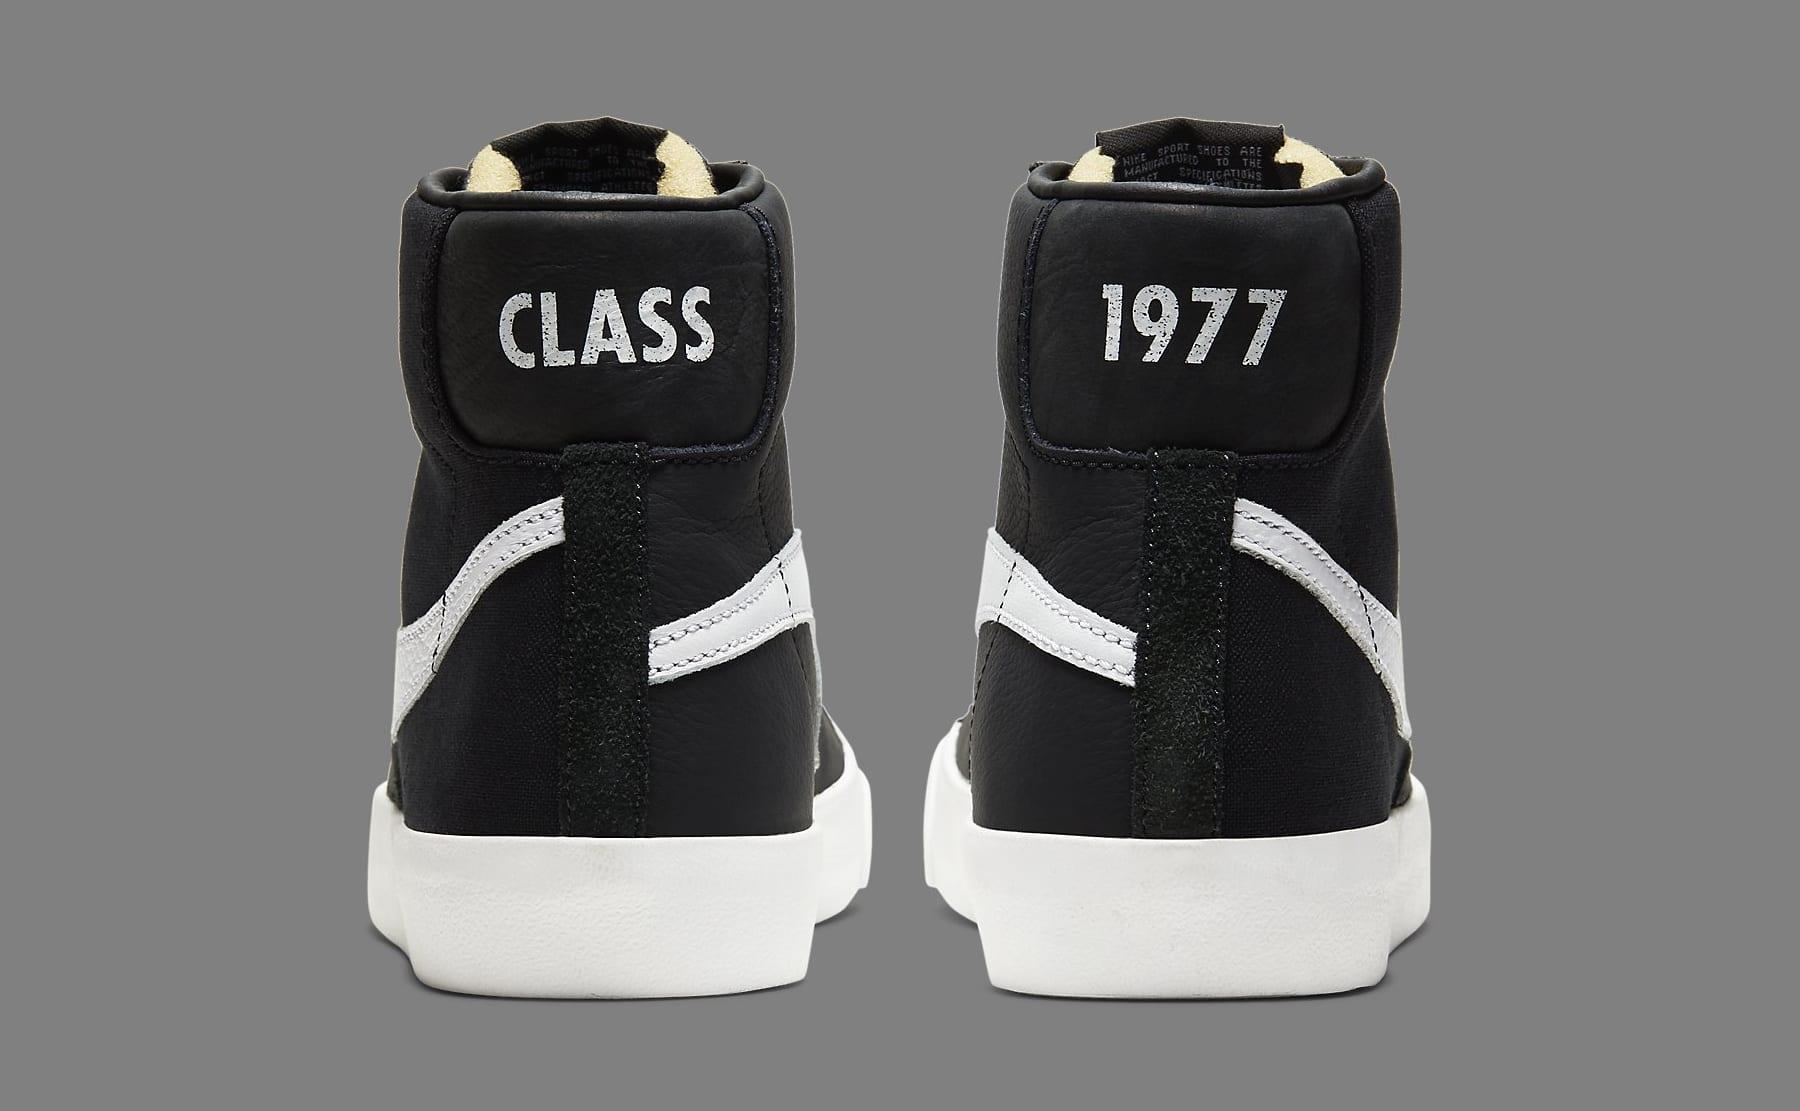 slam-jam-nike-blazer-mid-black-collab-cd8233-001-heel